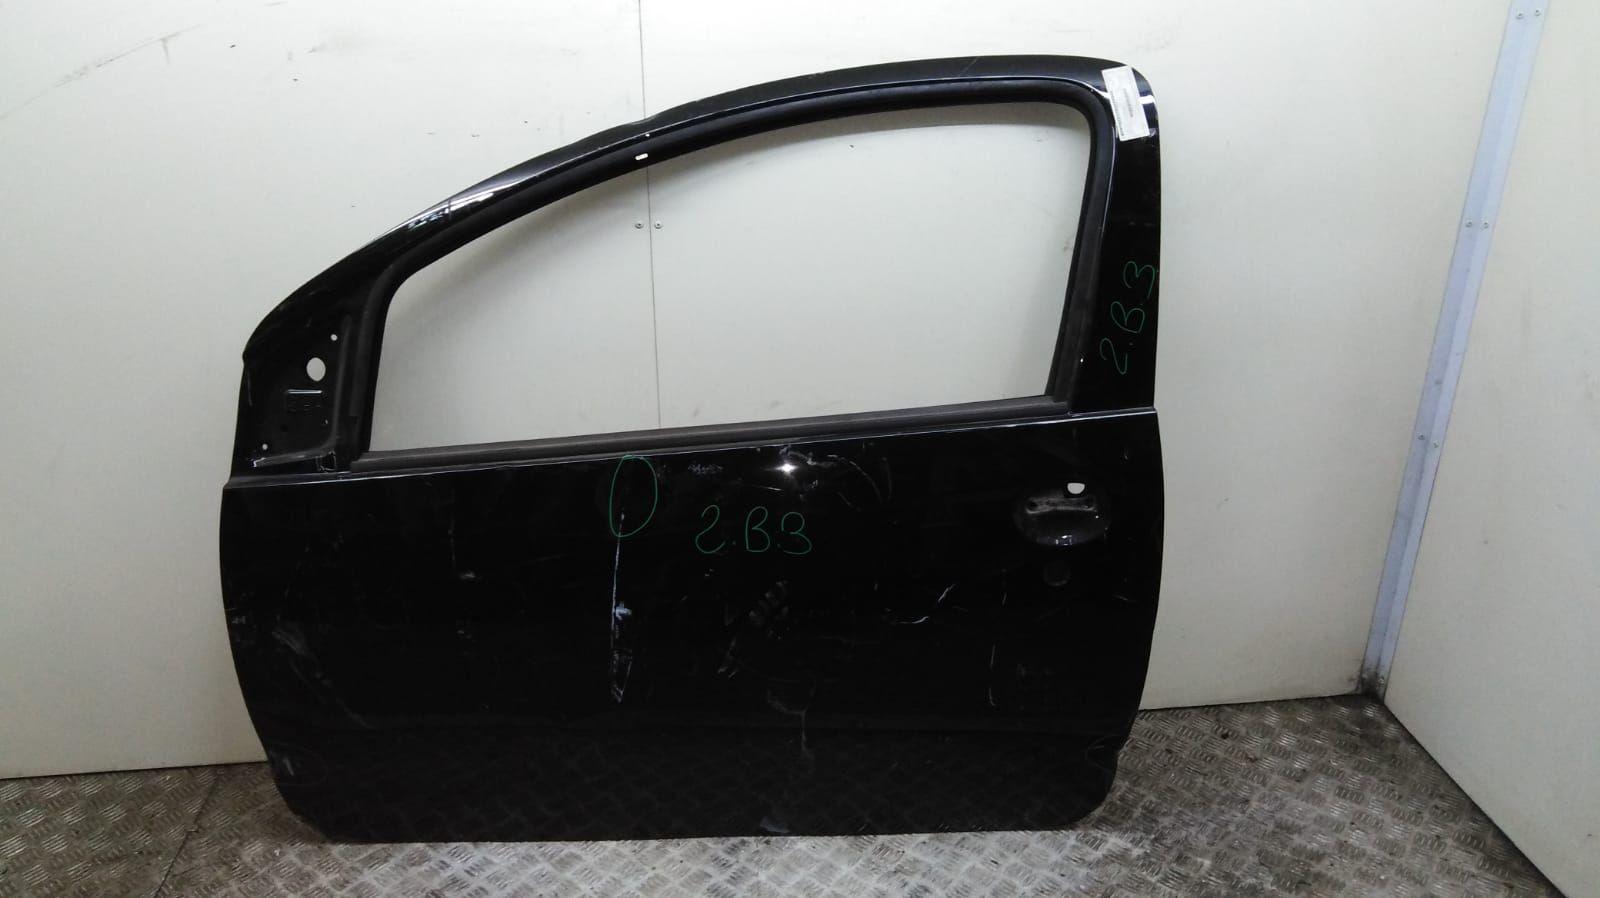 PORTIERA ANTERIORE SINISTRA PEUGEOT 107 1° Serie 1000 Benzina (2008) RICAMBI USATI